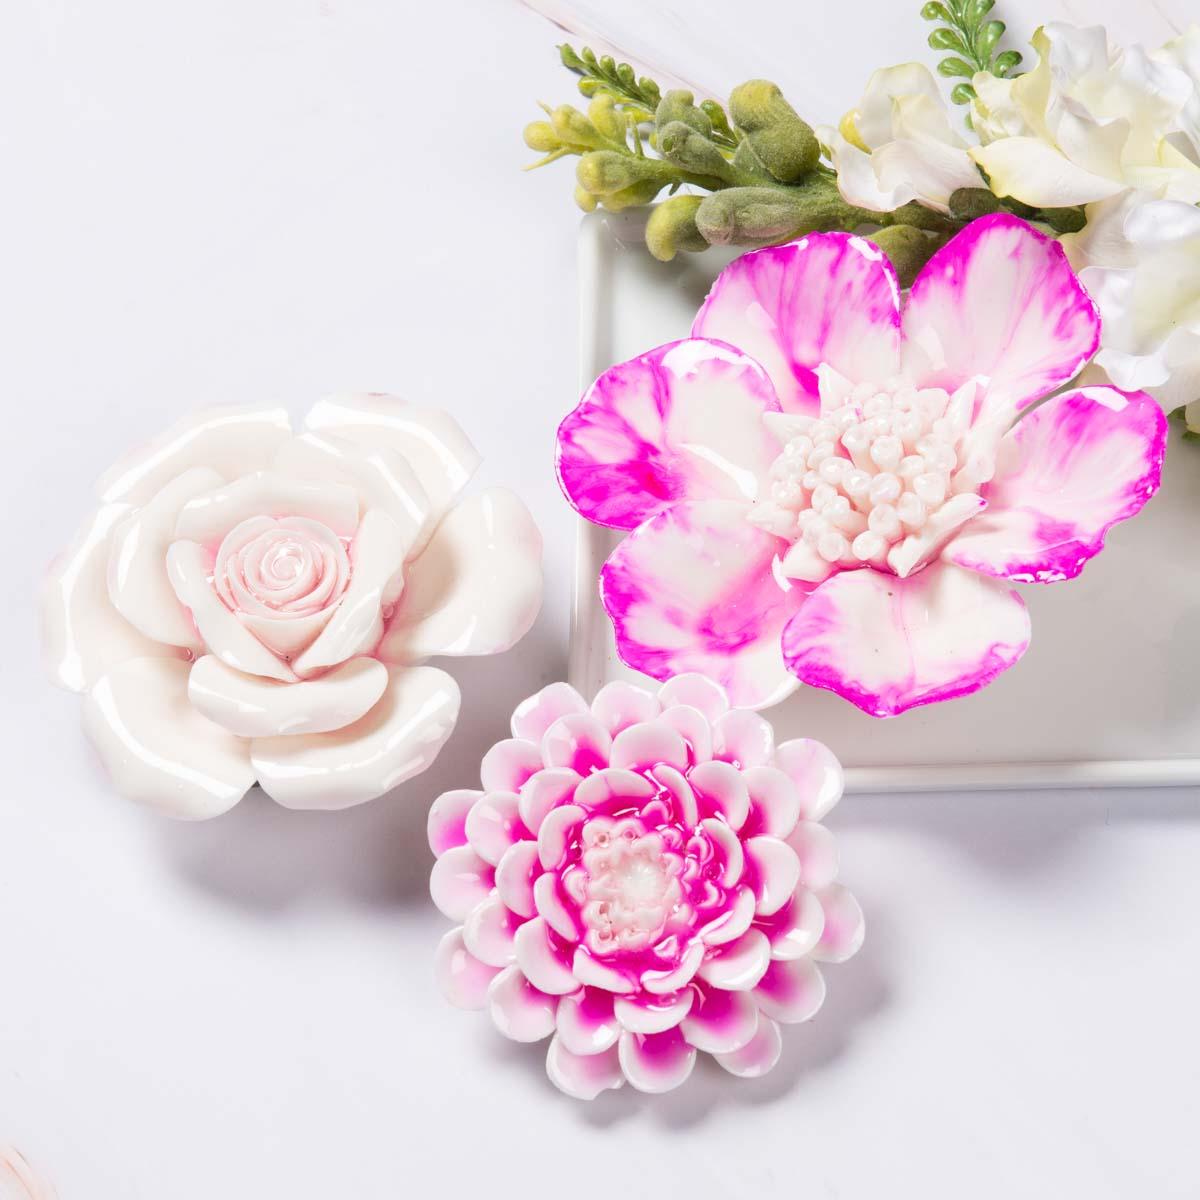 Pink Ceramic Flowers